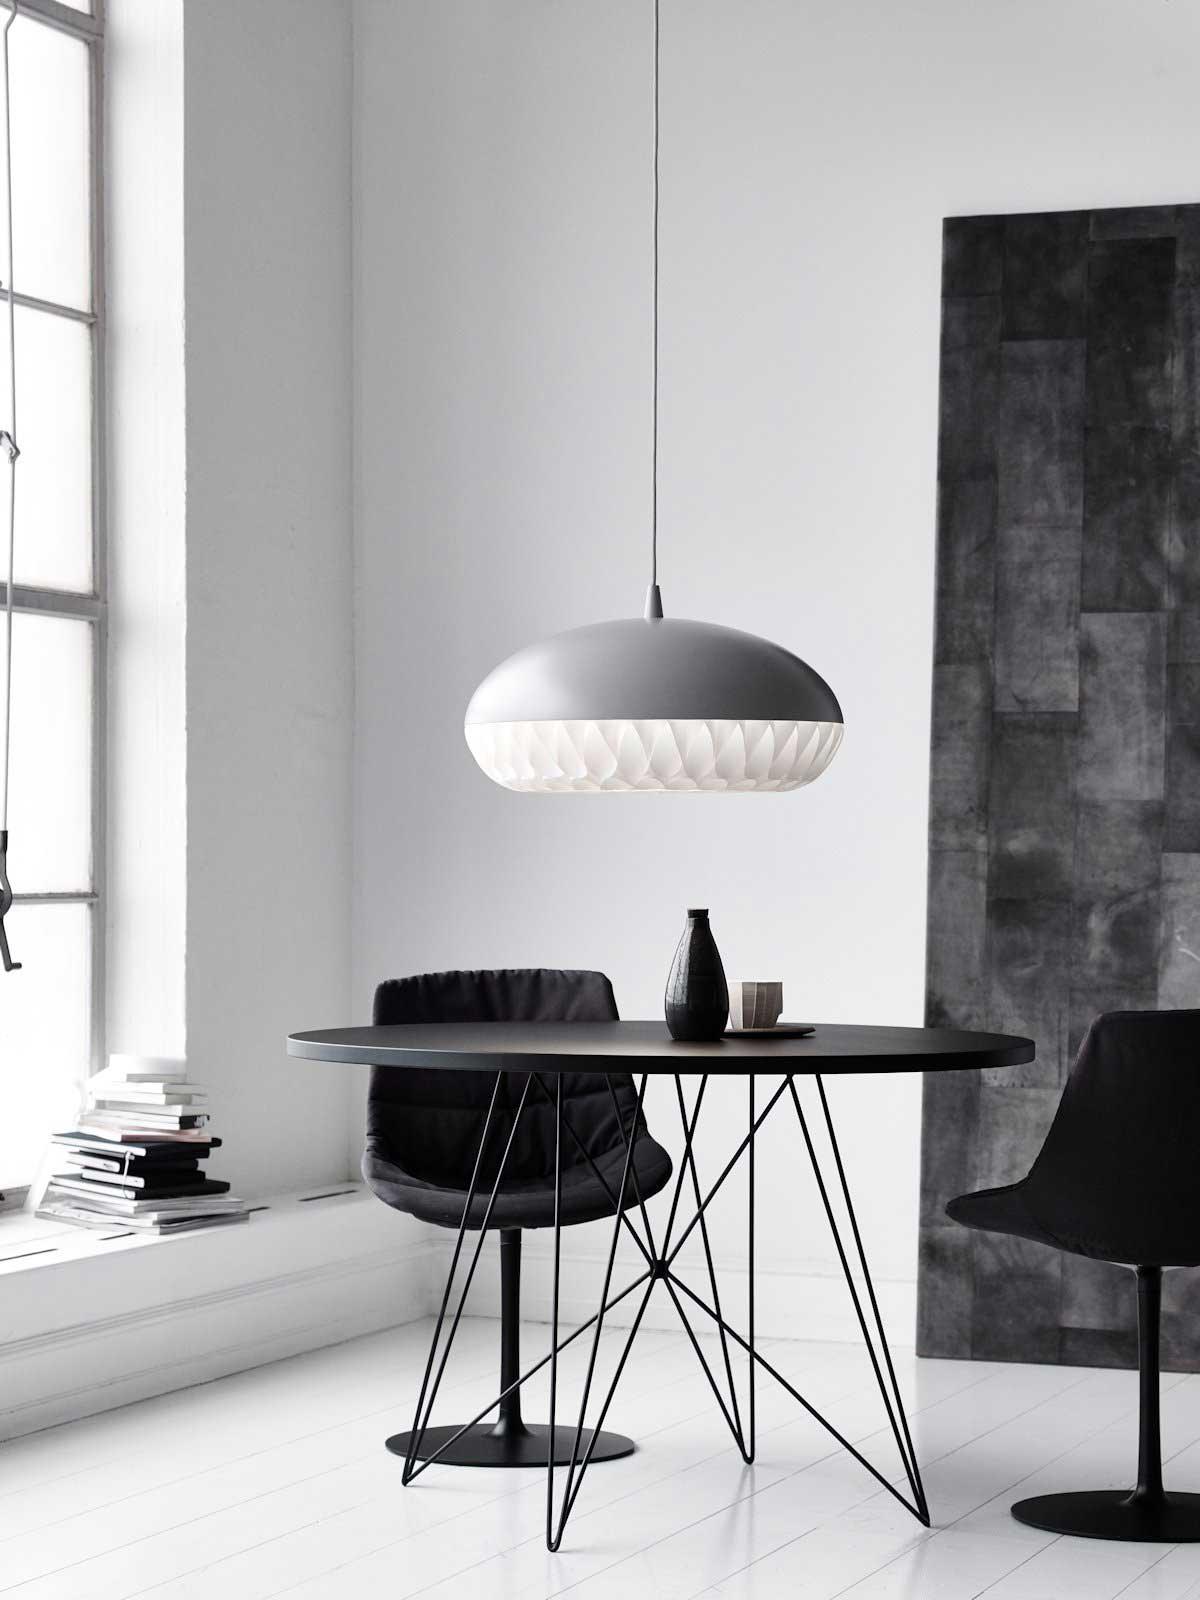 Aeon Rocket Lamp By Morten Voss